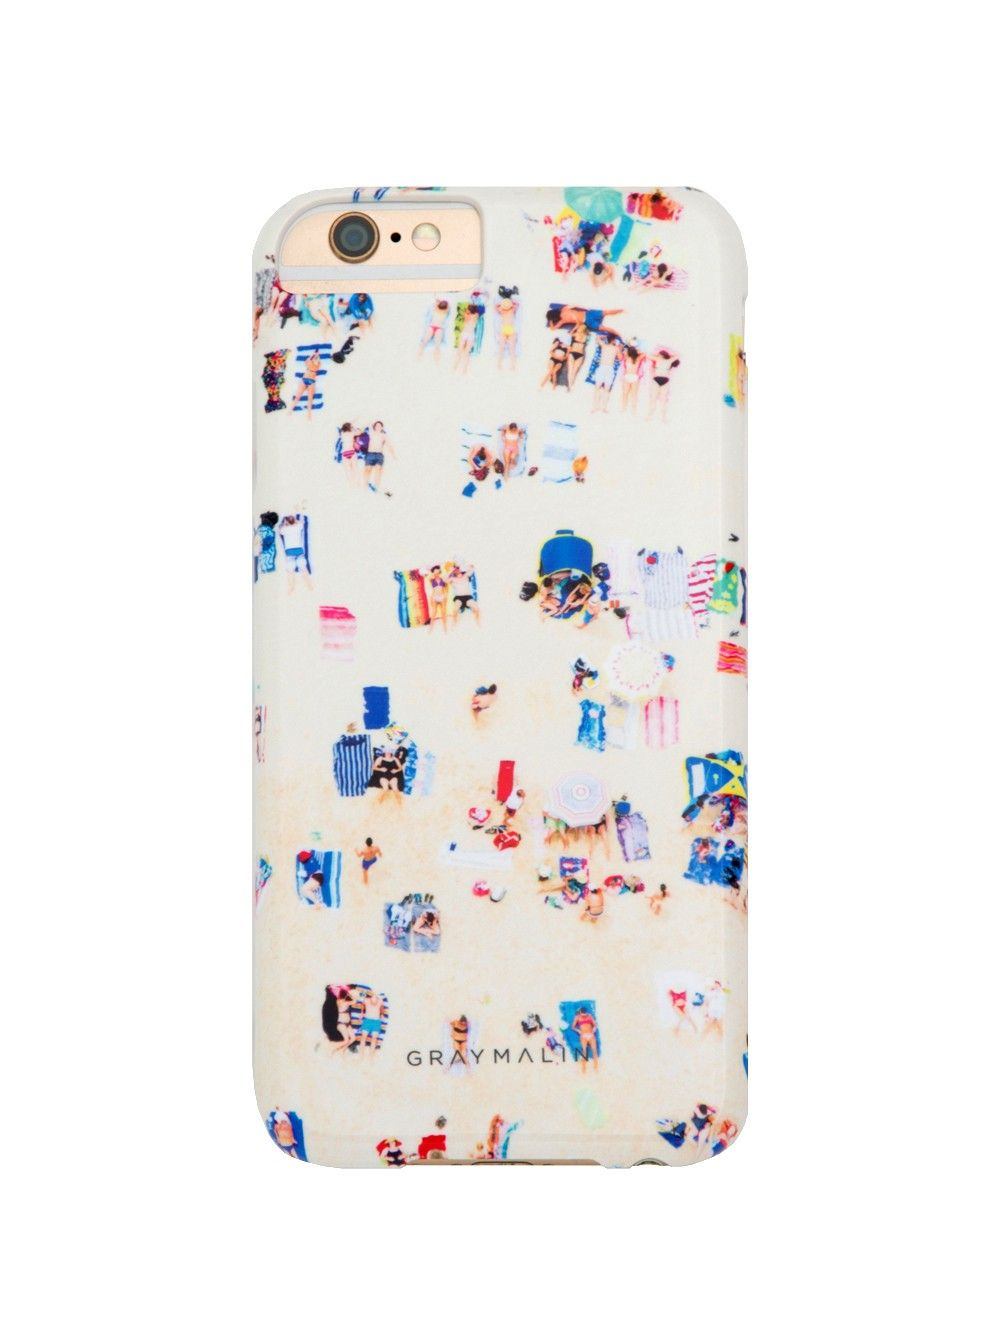 Gray Malin The Bondi - iPhone 6 Case | The Wish List | Pinterest ...